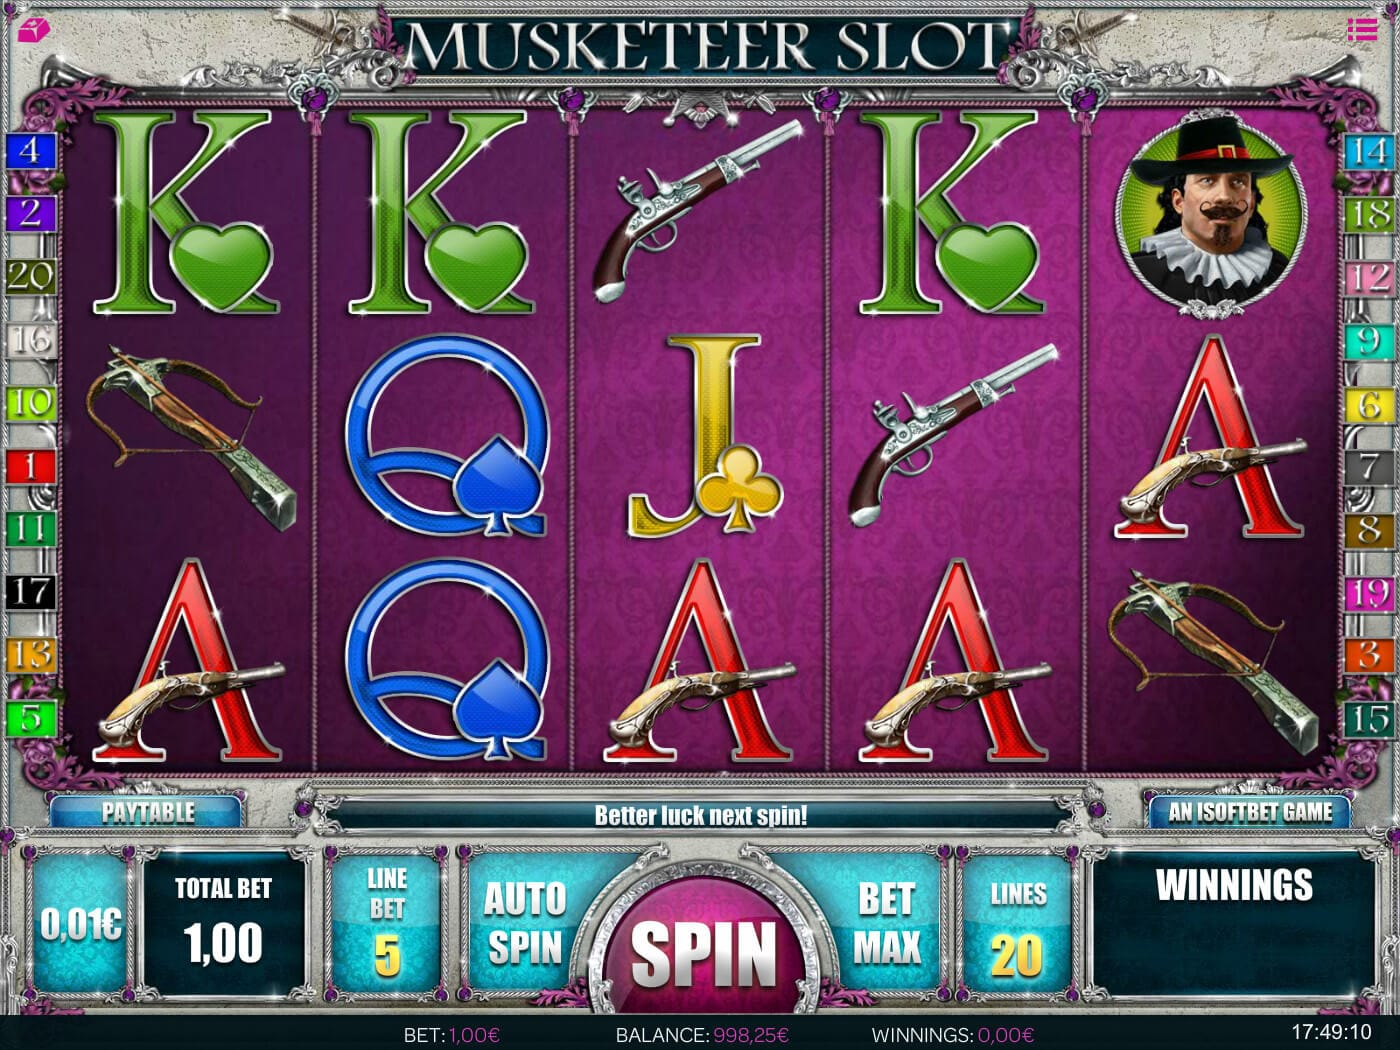 Musketeer Slot Gameplay